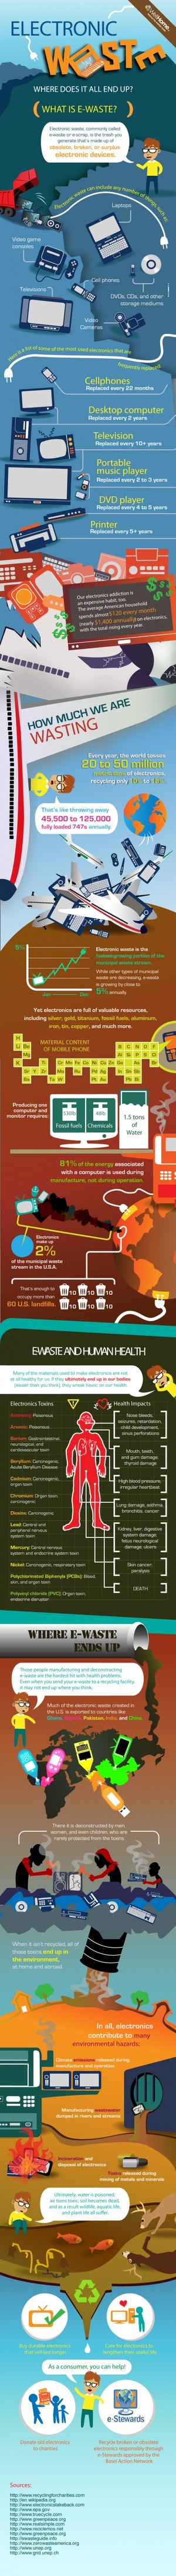 Electronic Waste: Where Does it End Up? | eWasteDirect.com